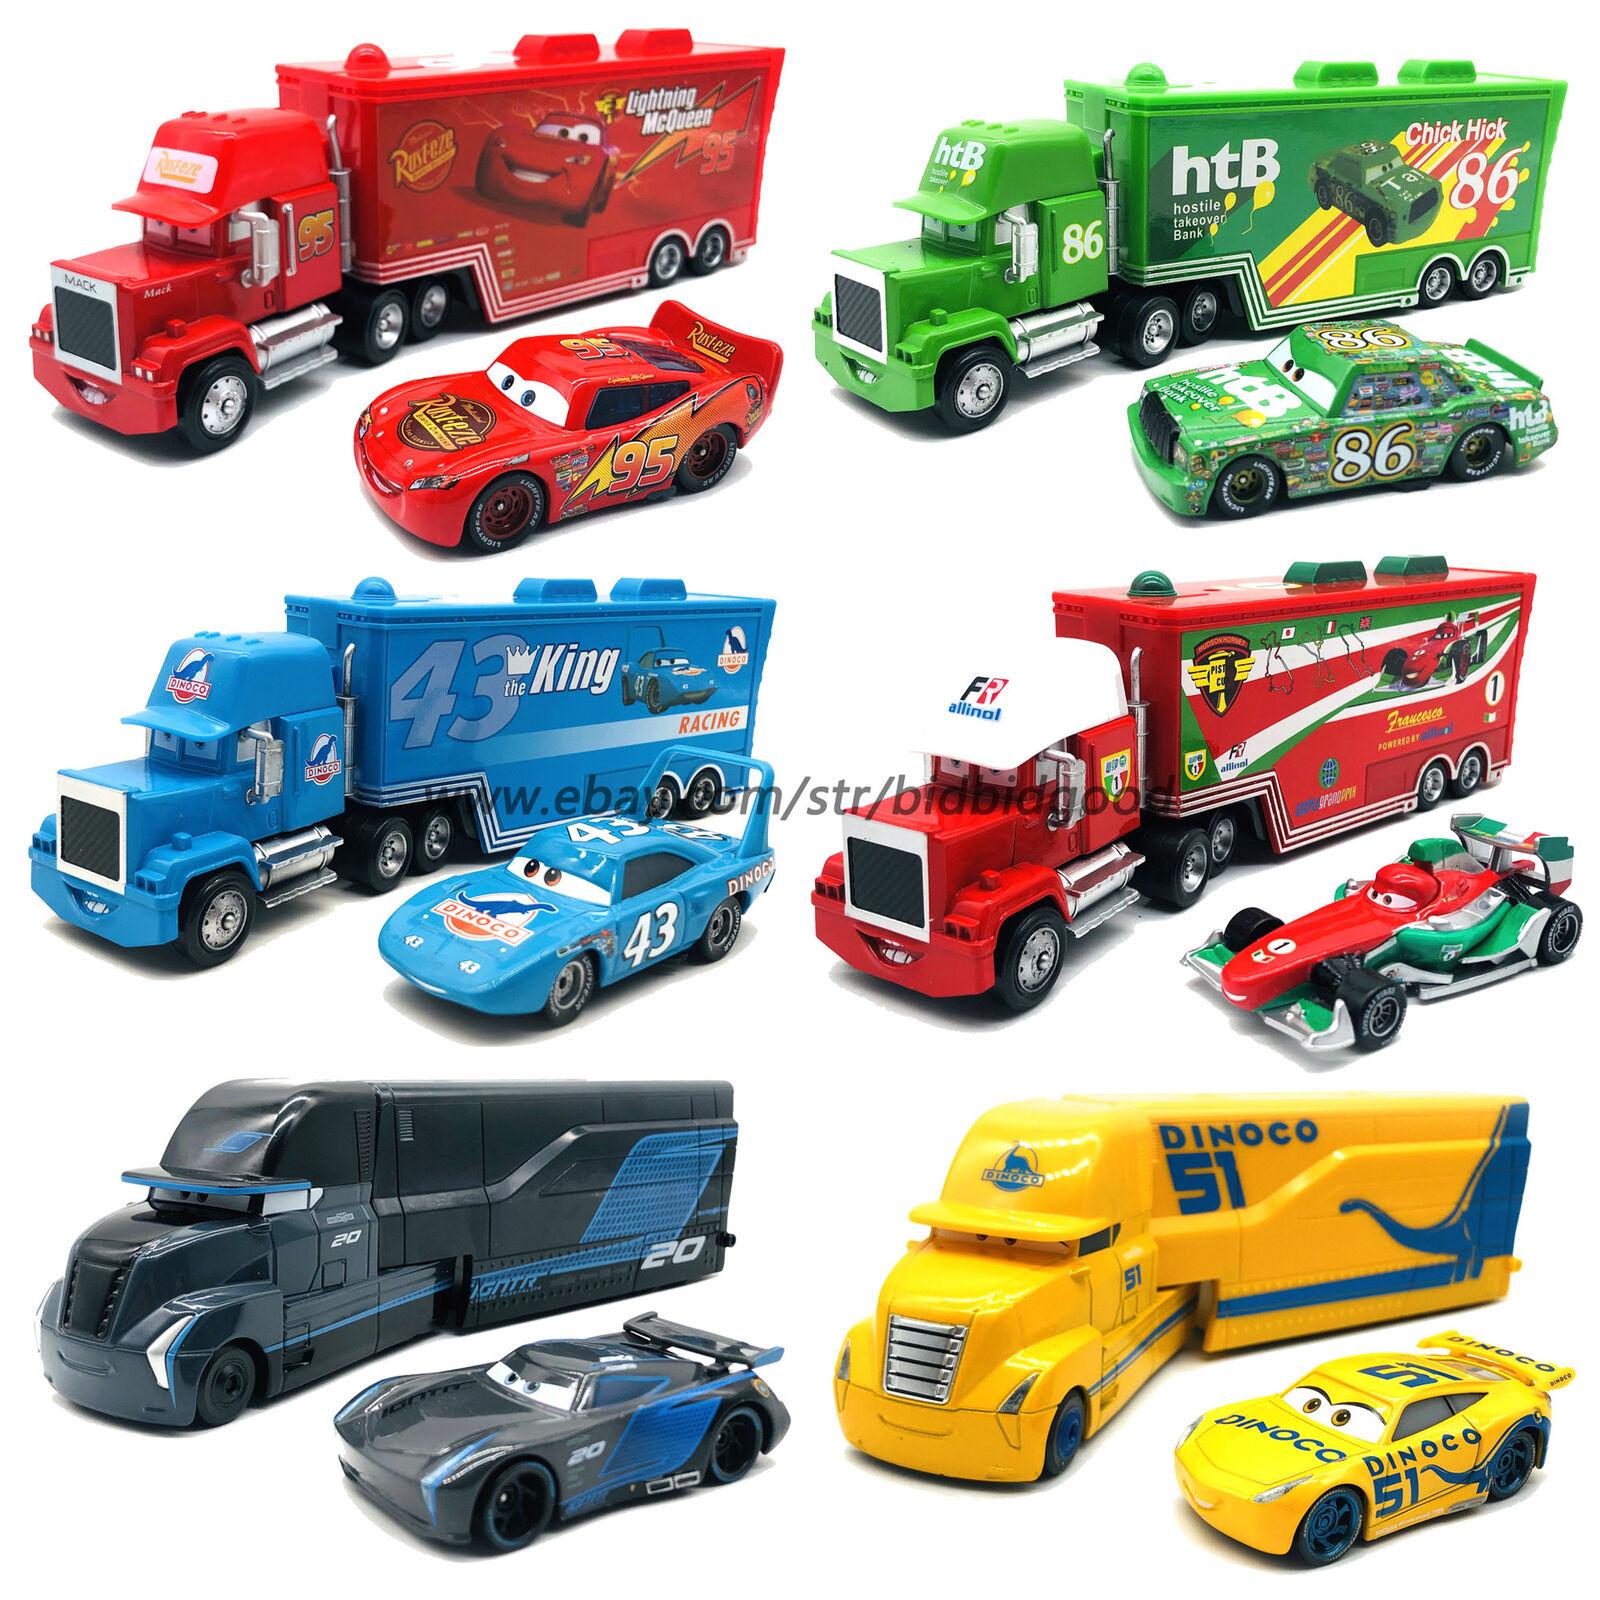 Disney Pixar Cars Wally Hauler Walmart Truck For Sale Online Ebay